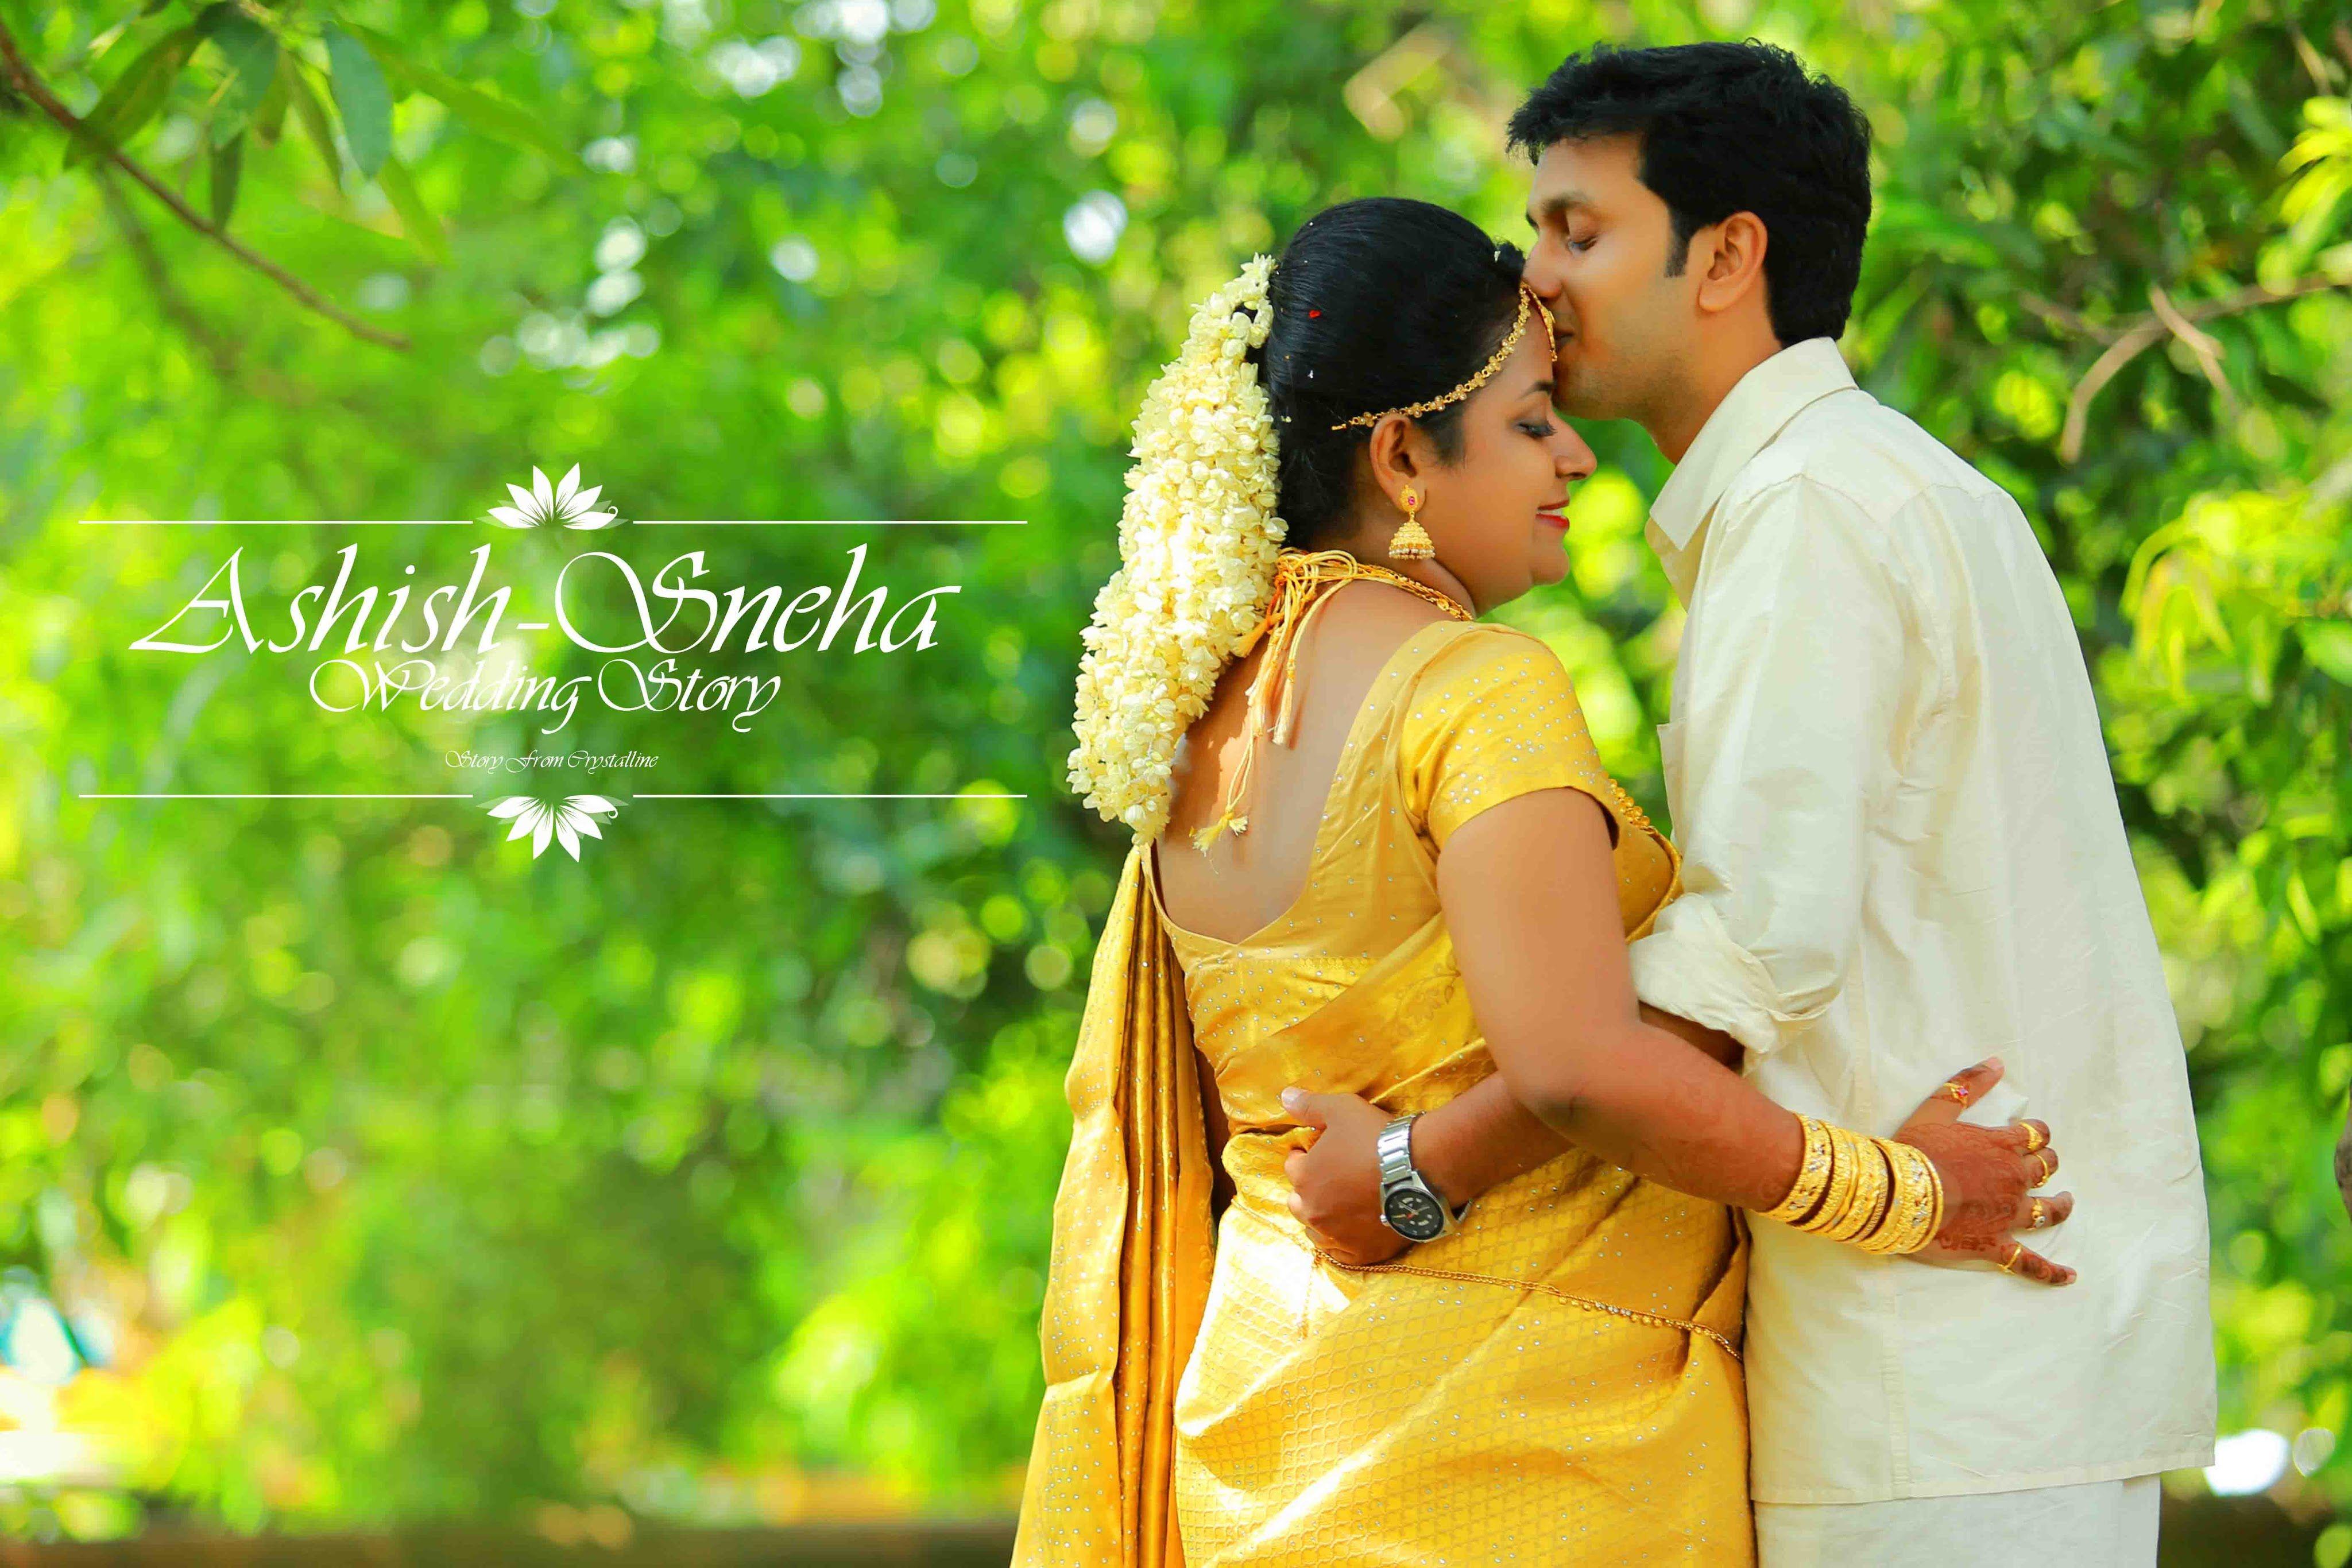 Kerala wedding photography - Photography Kerala Hindu Wedding Highlight Ashish Sneha Crystalline Studio